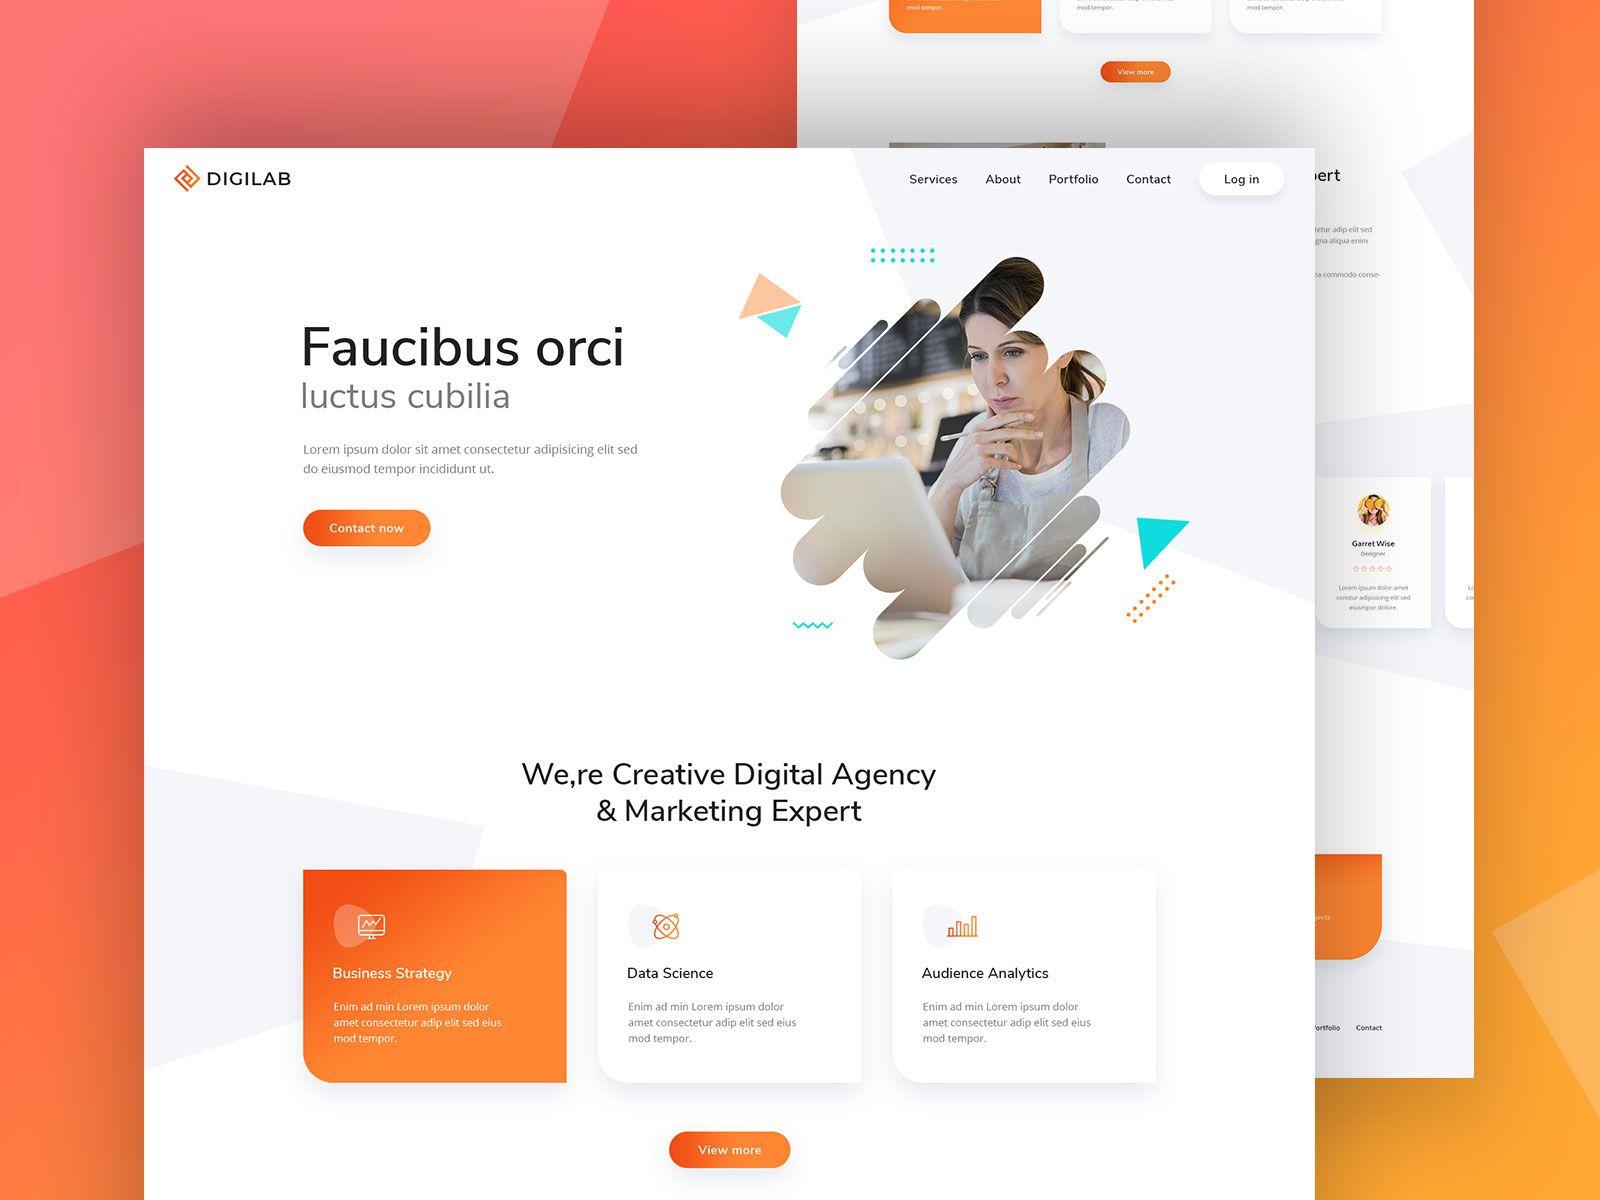 Digital Marketing Agency Digital Marketing Agency Web Development Design Food Web Design